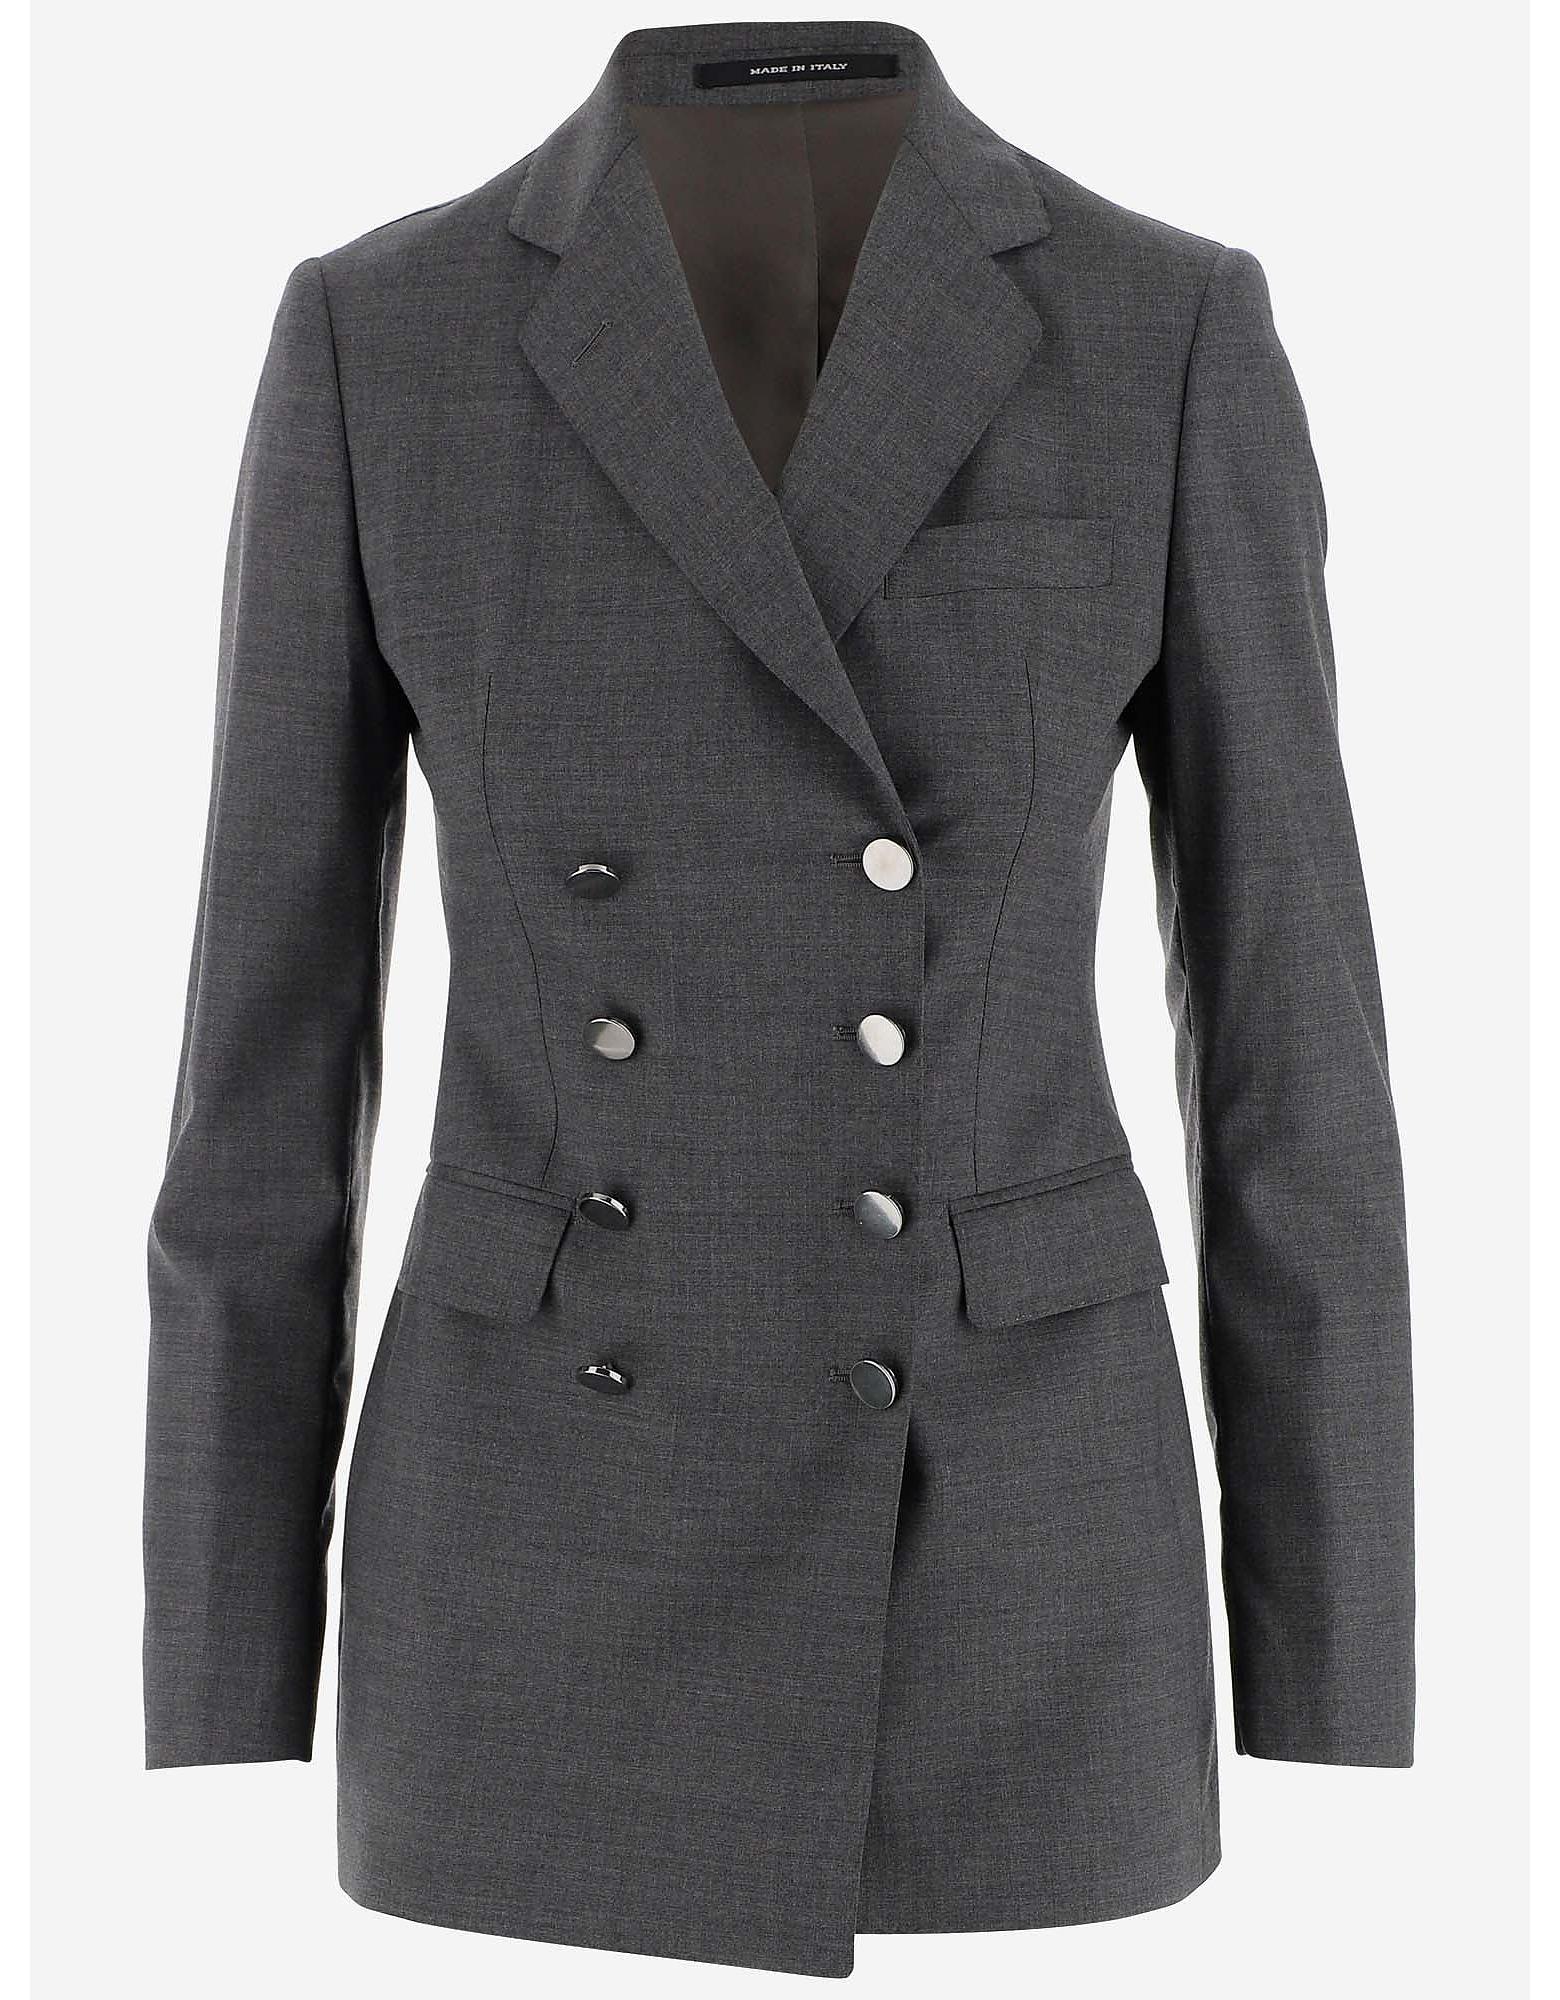 Tagliatore Designer Coats & Jackets, Double-breasted Women's Blazer